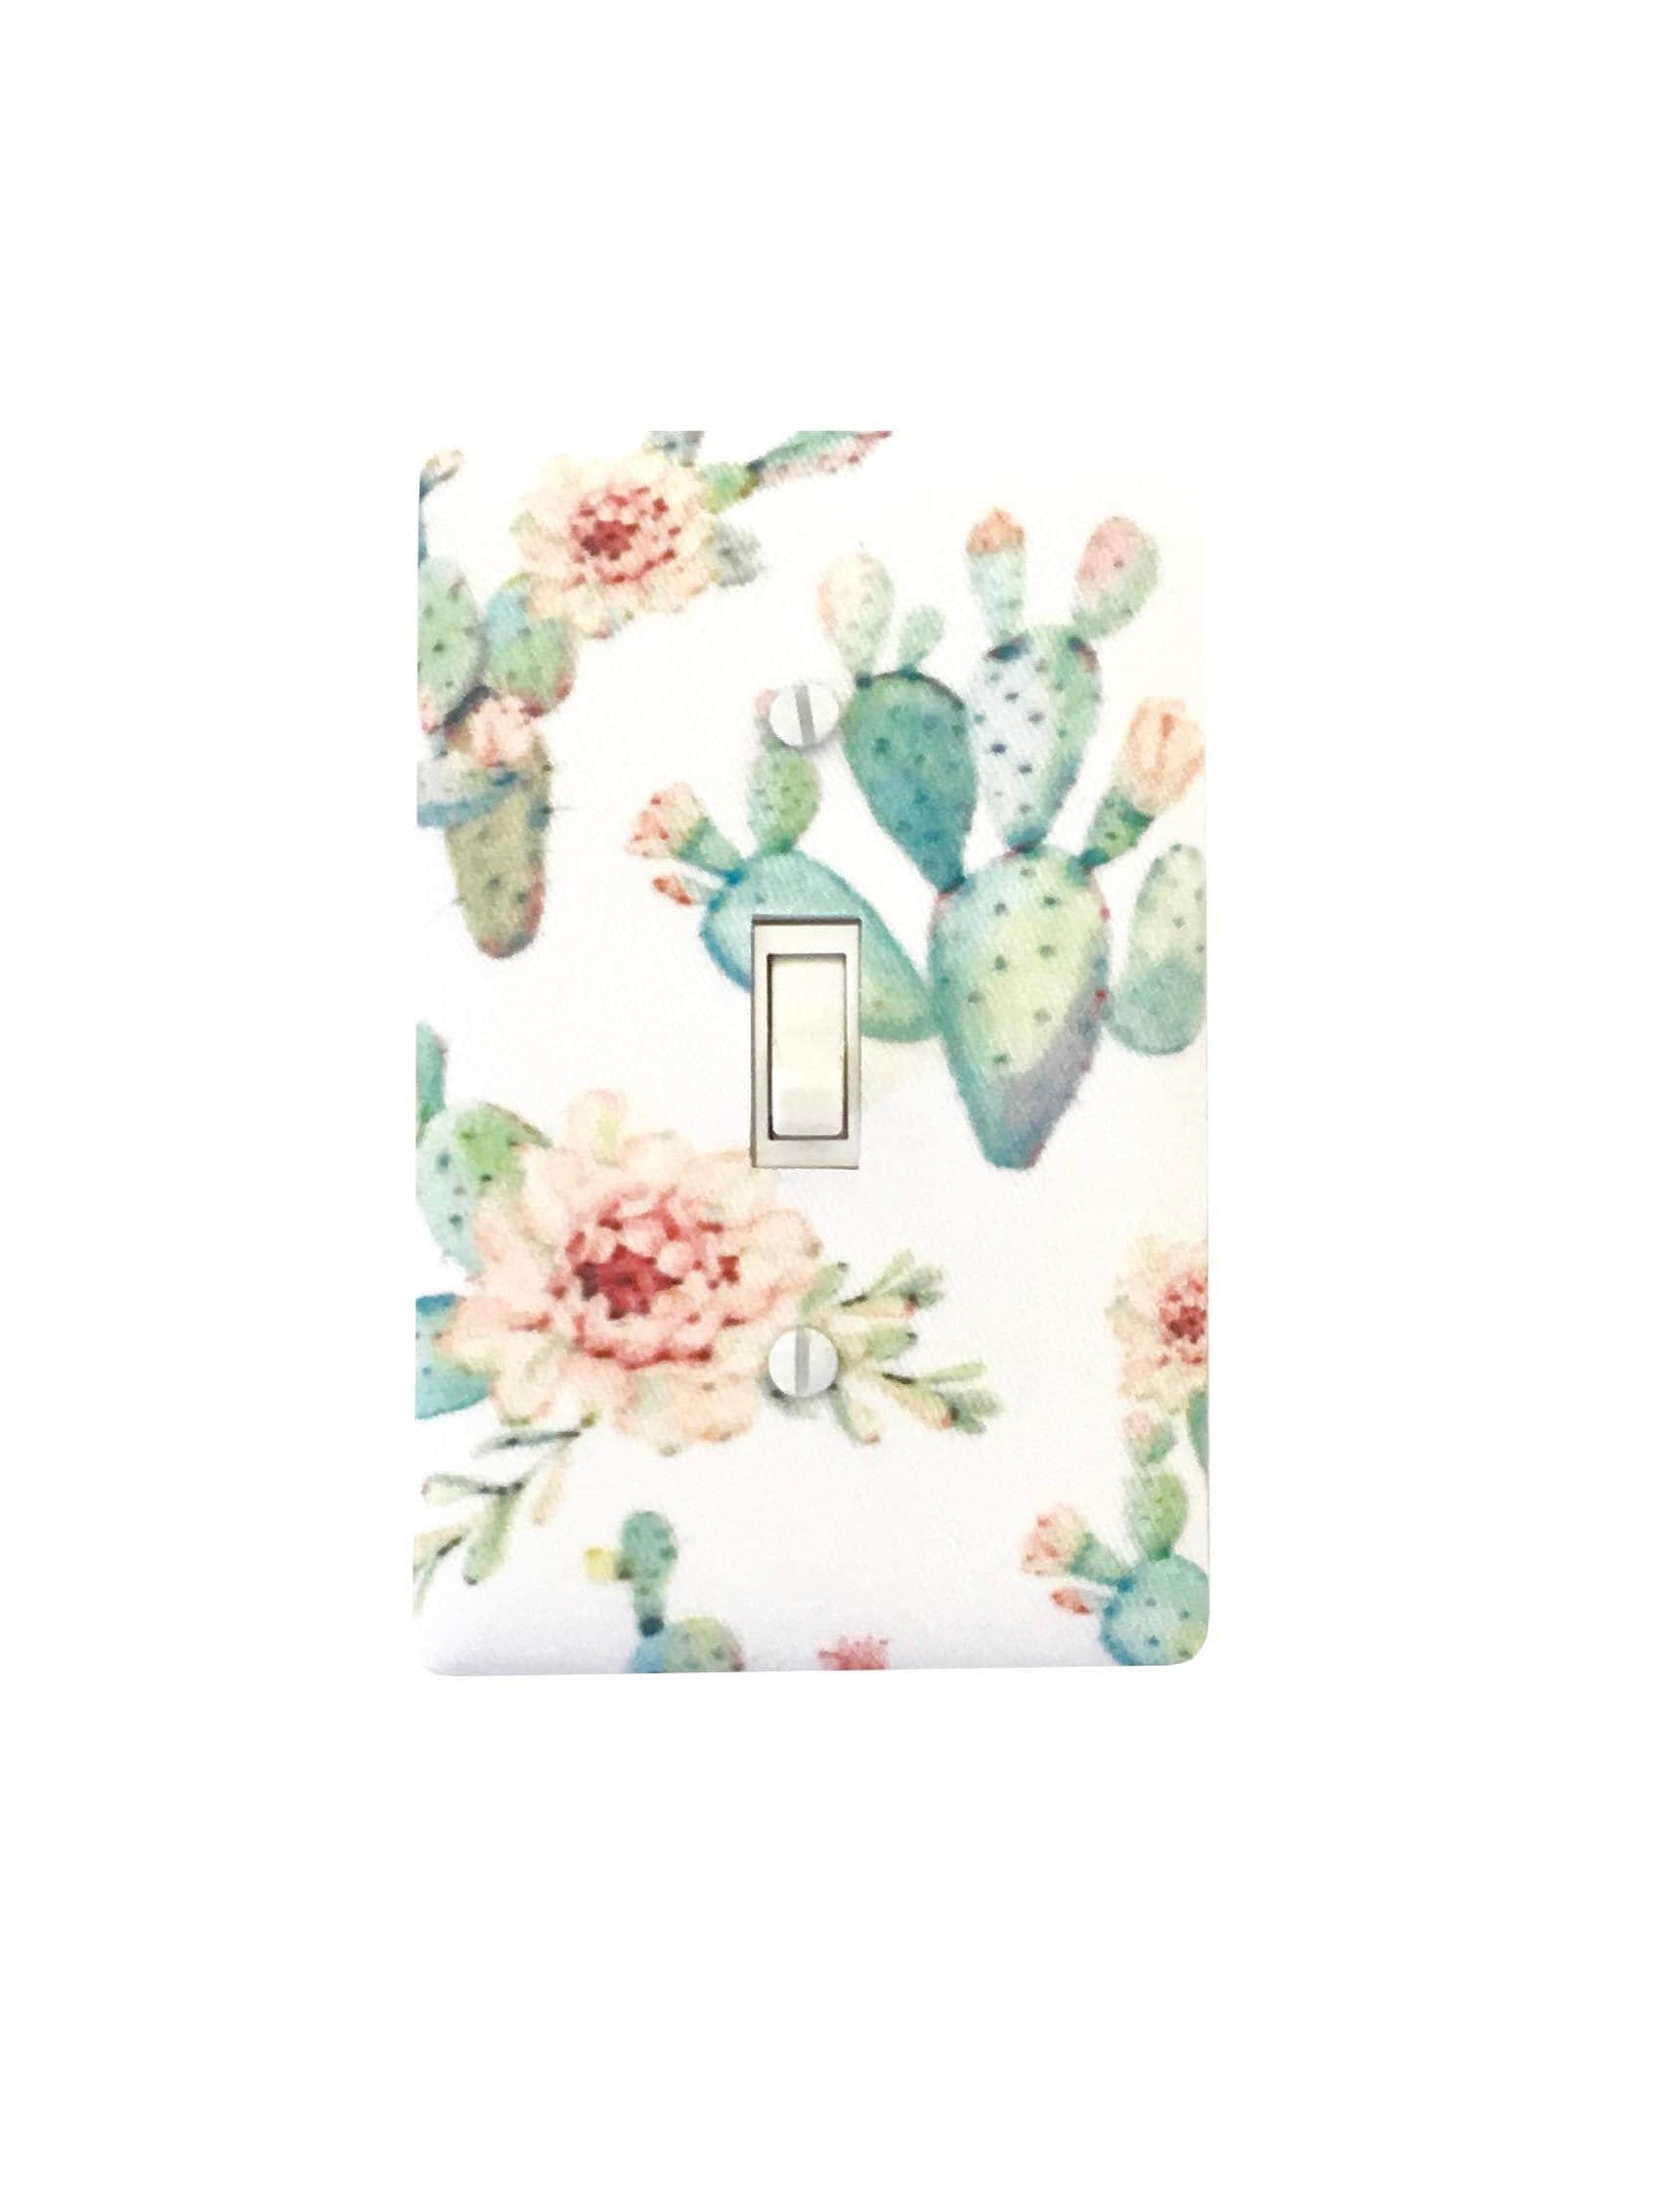 Cactus Light Switch Plate Cover Girls Room Bathroom Decor Etsy